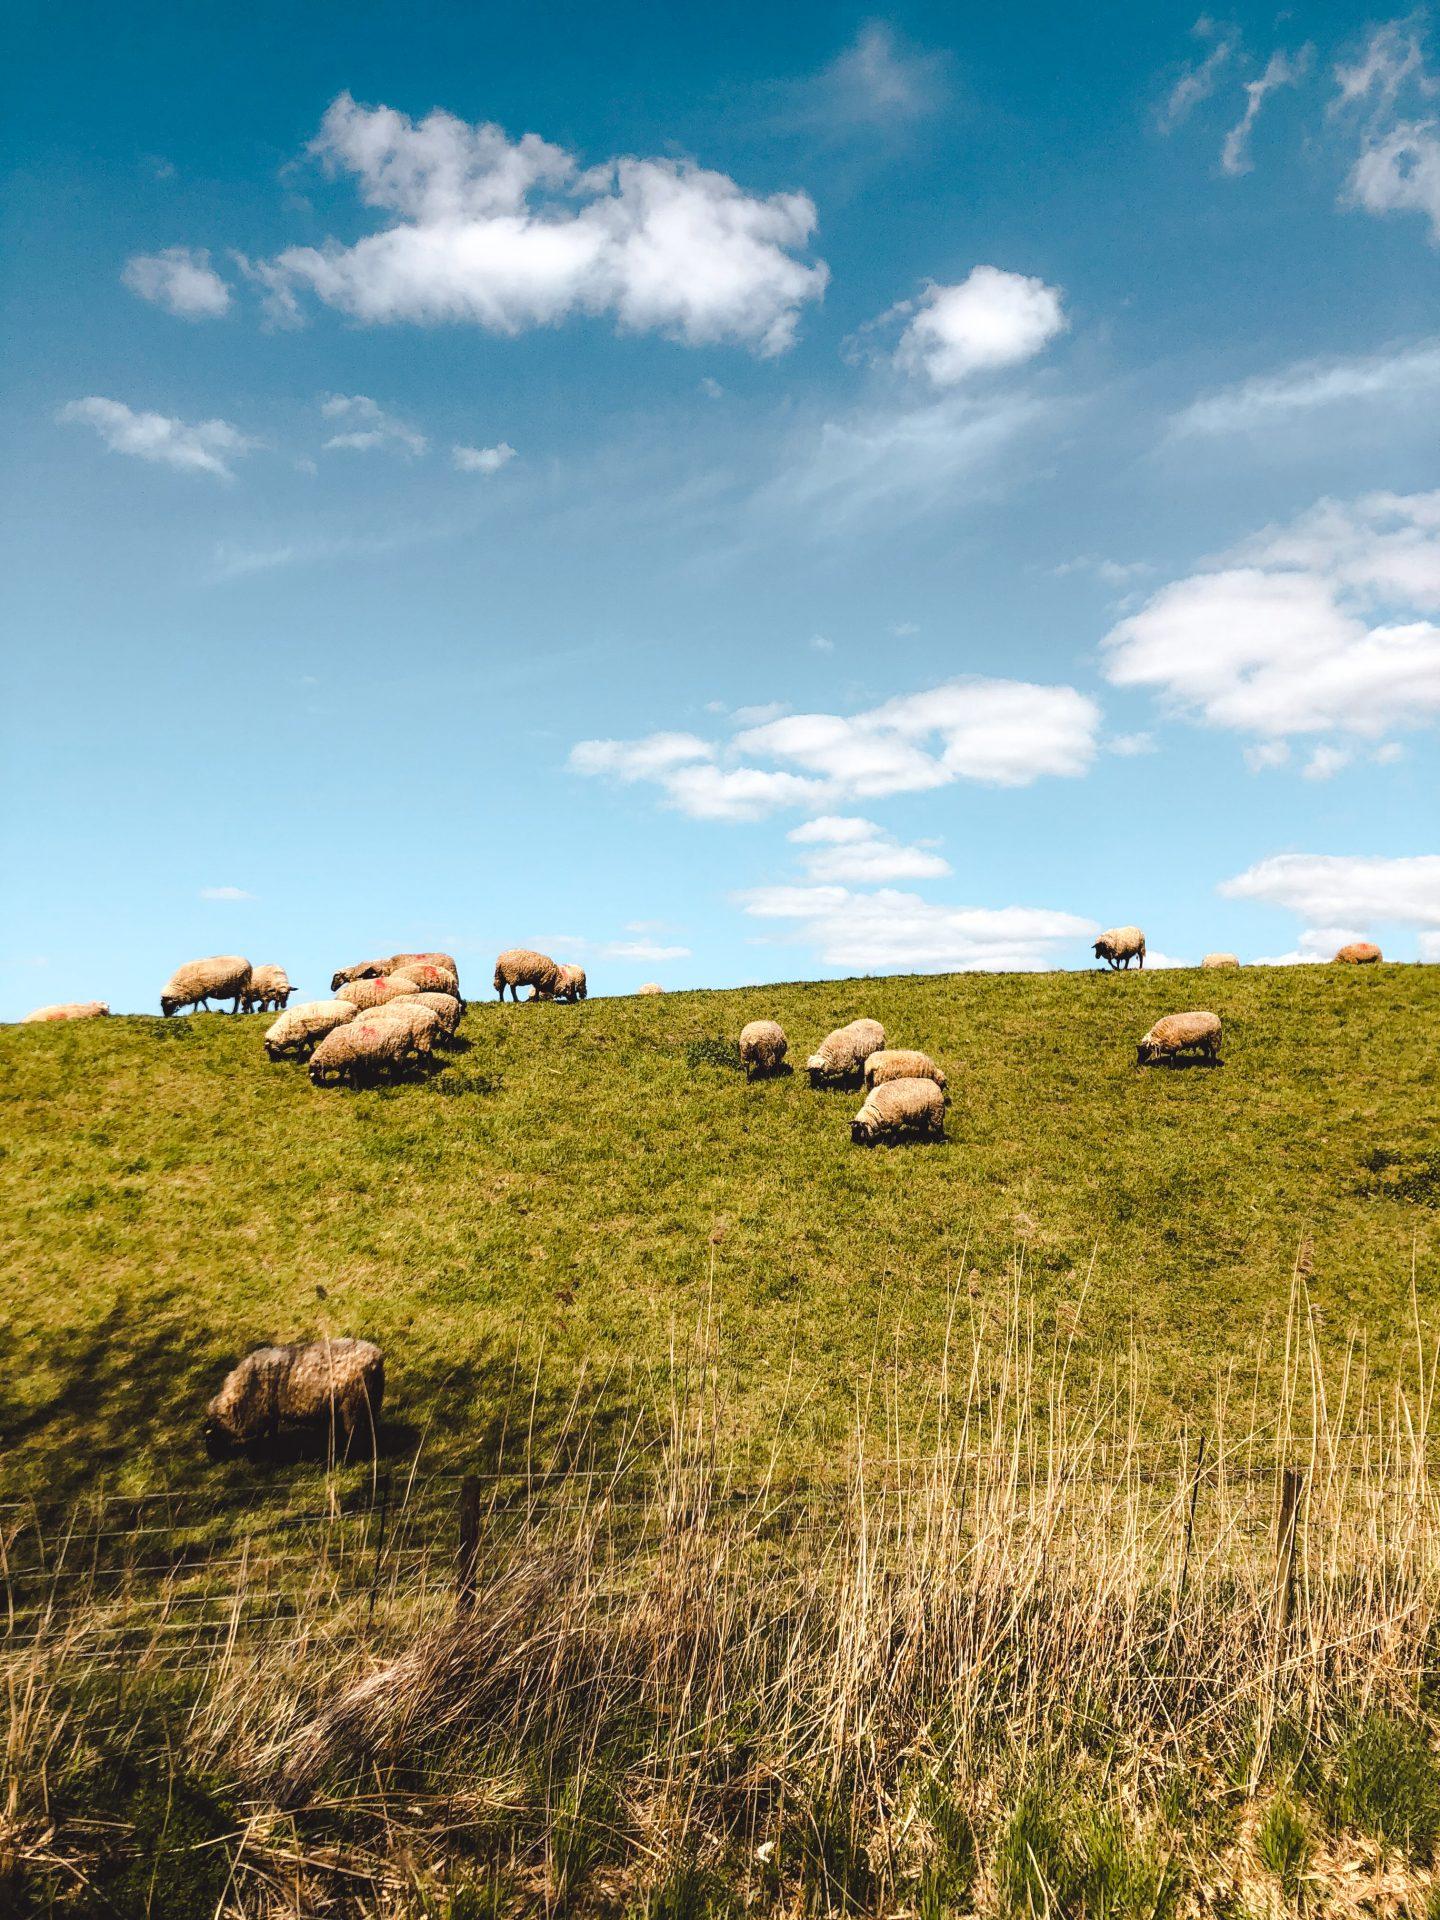 Sheep in Altes Land Hamburg